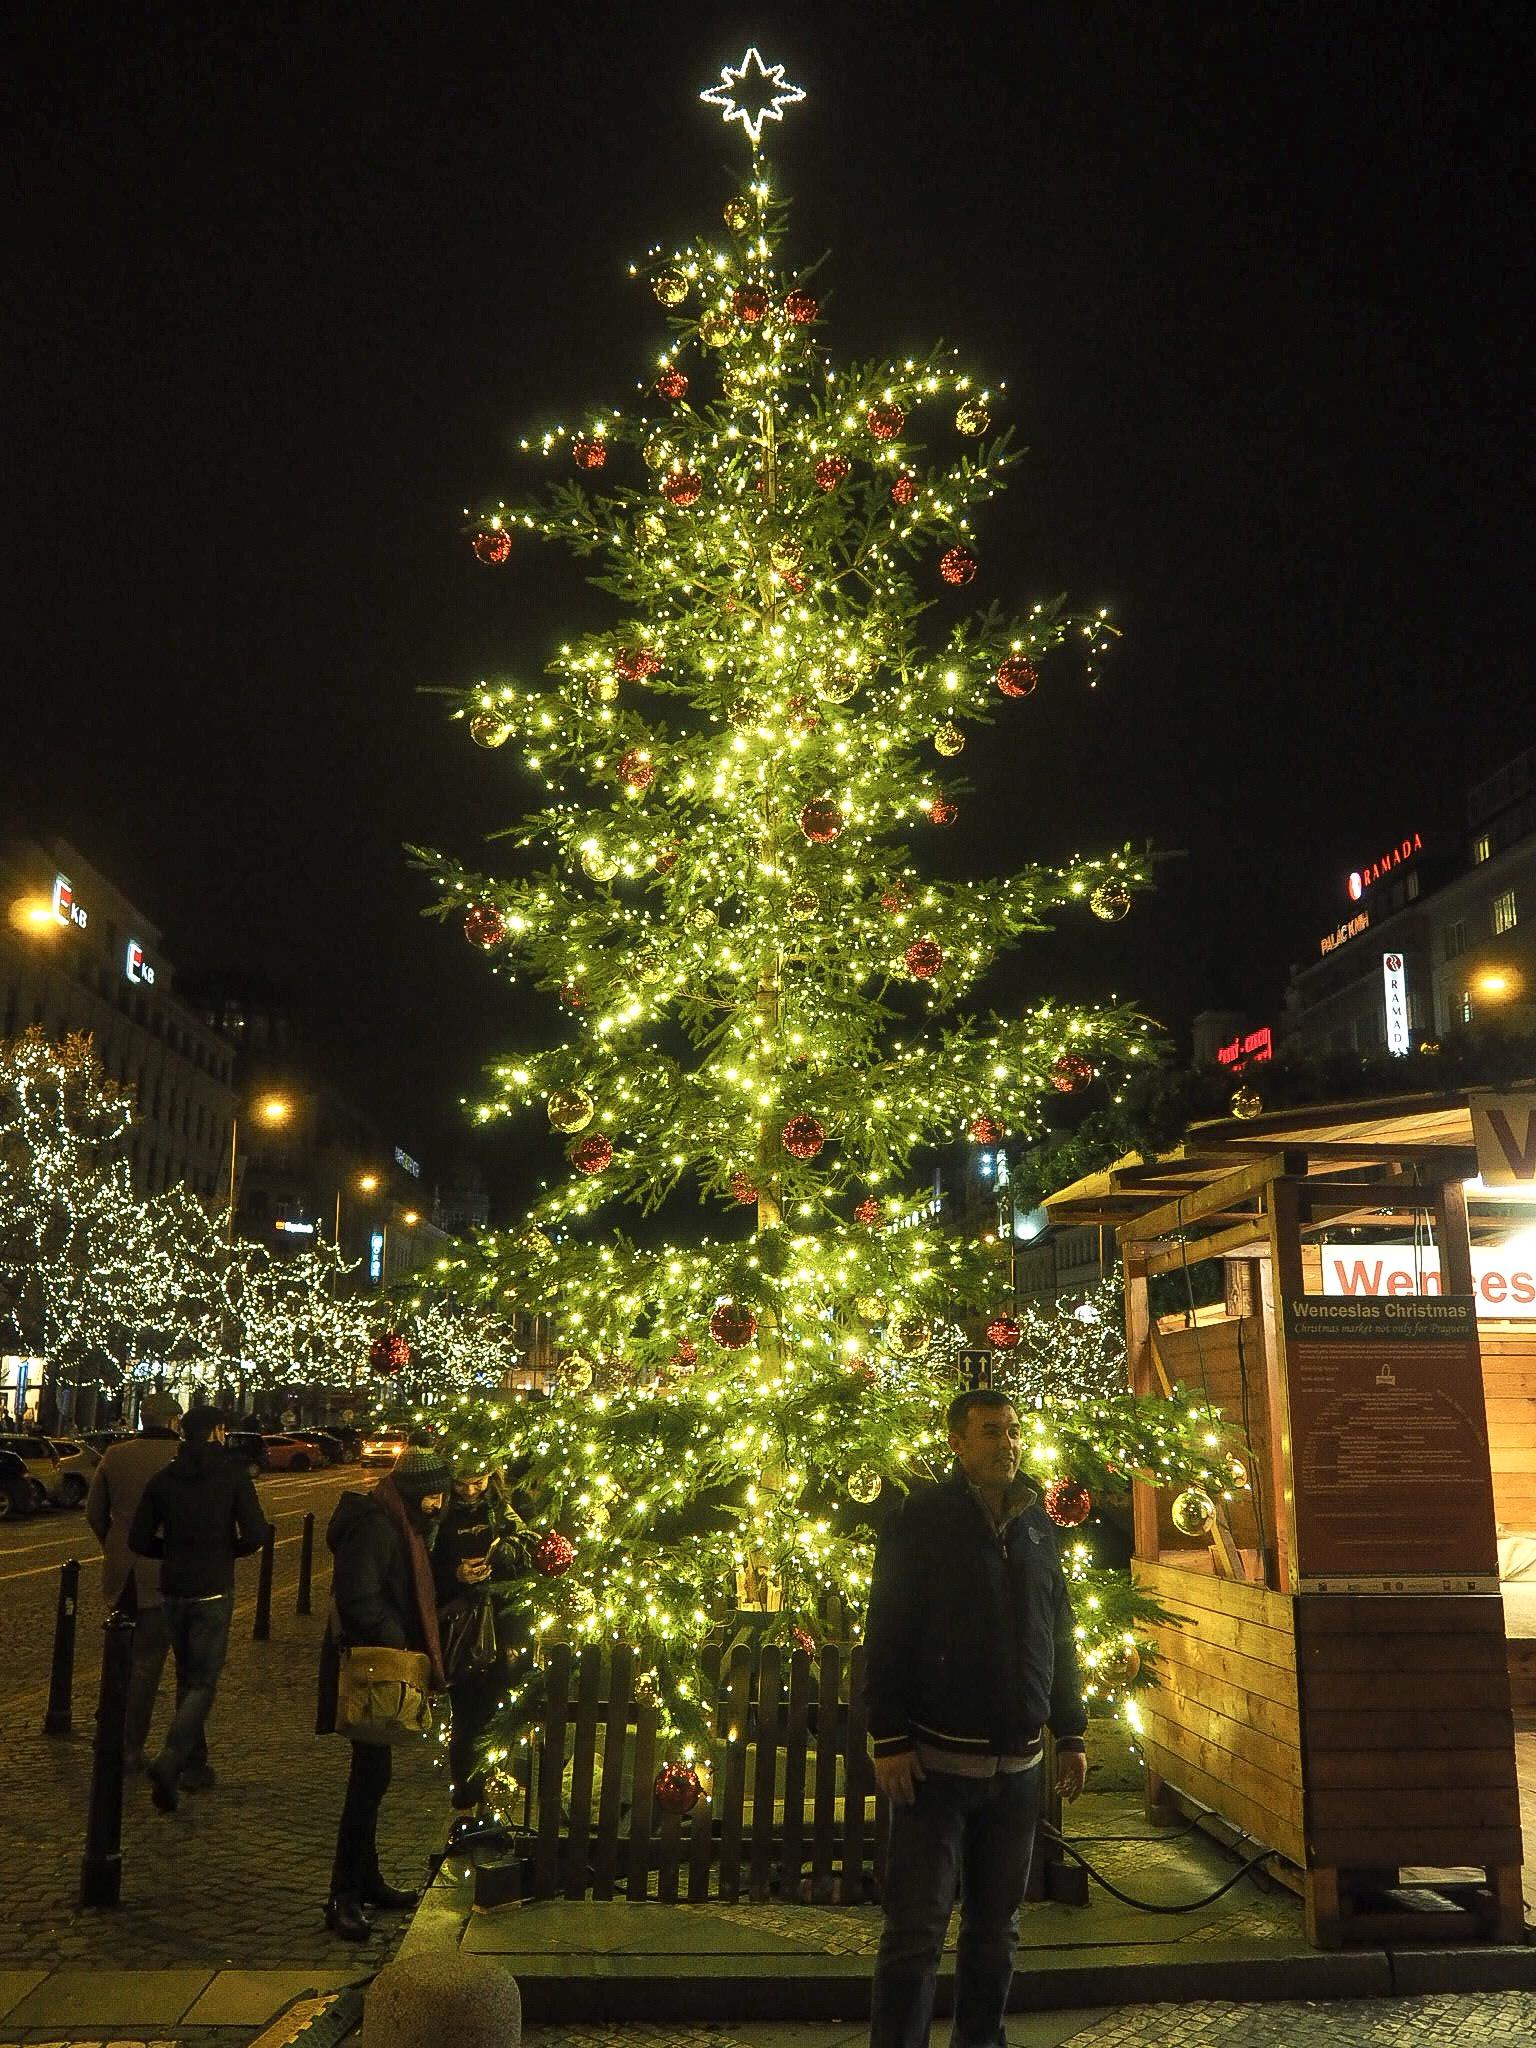 Wenceslas Square christmas market